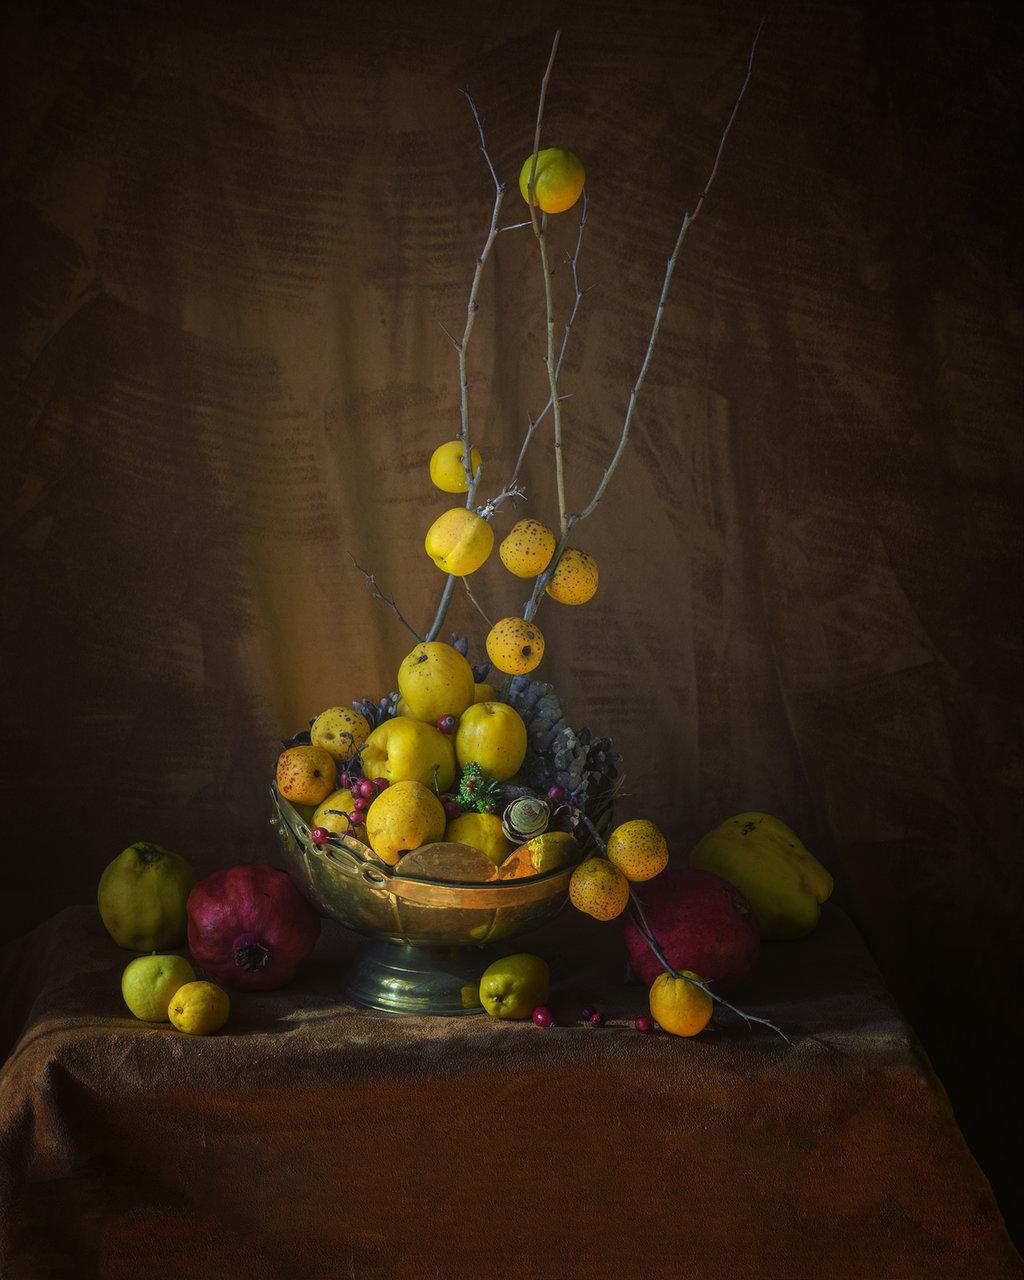 Хеномелес /японска дюля/ | Author ppaulina | PHOTO FORUM